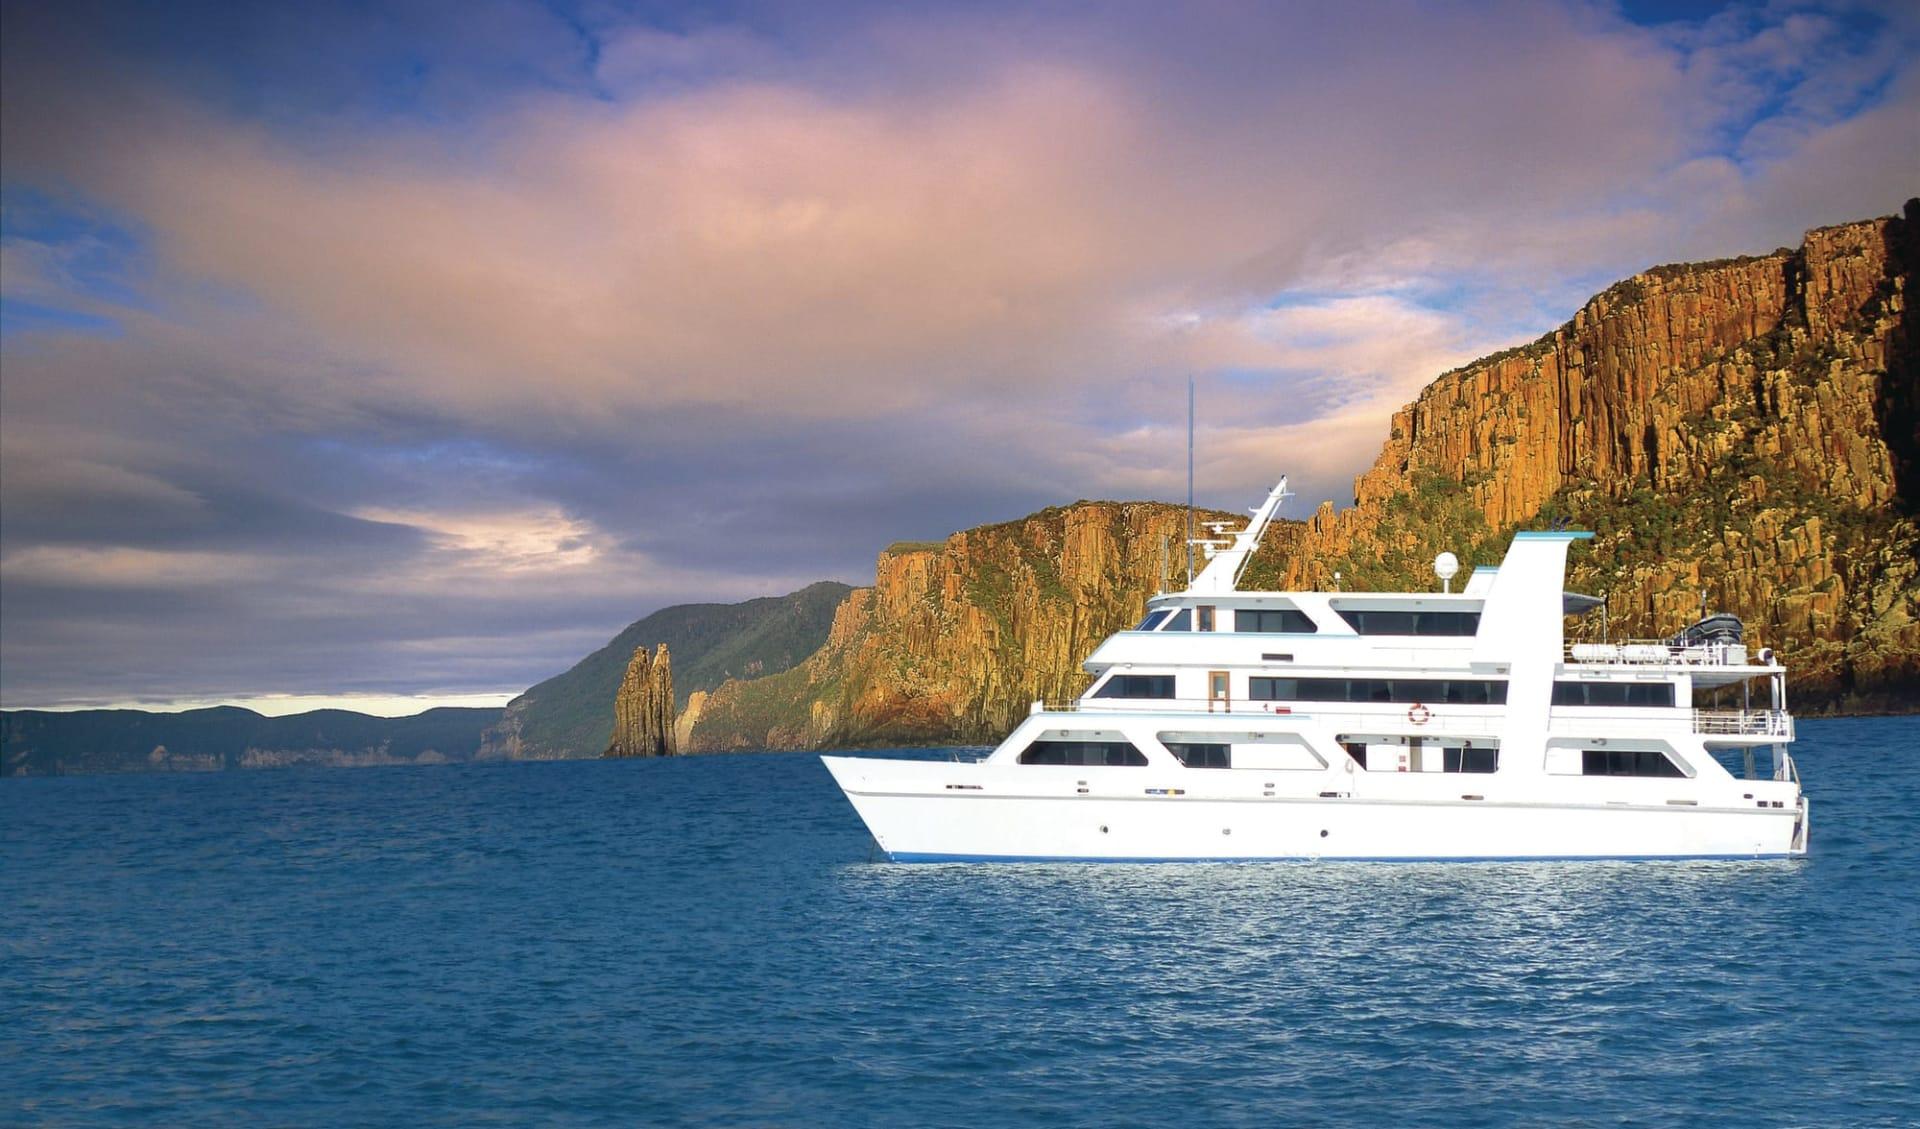 Coral Expeditions / Tasmanien ab Hobart: Australia - Tasmania - Tasman NP - Coral Expeditions I